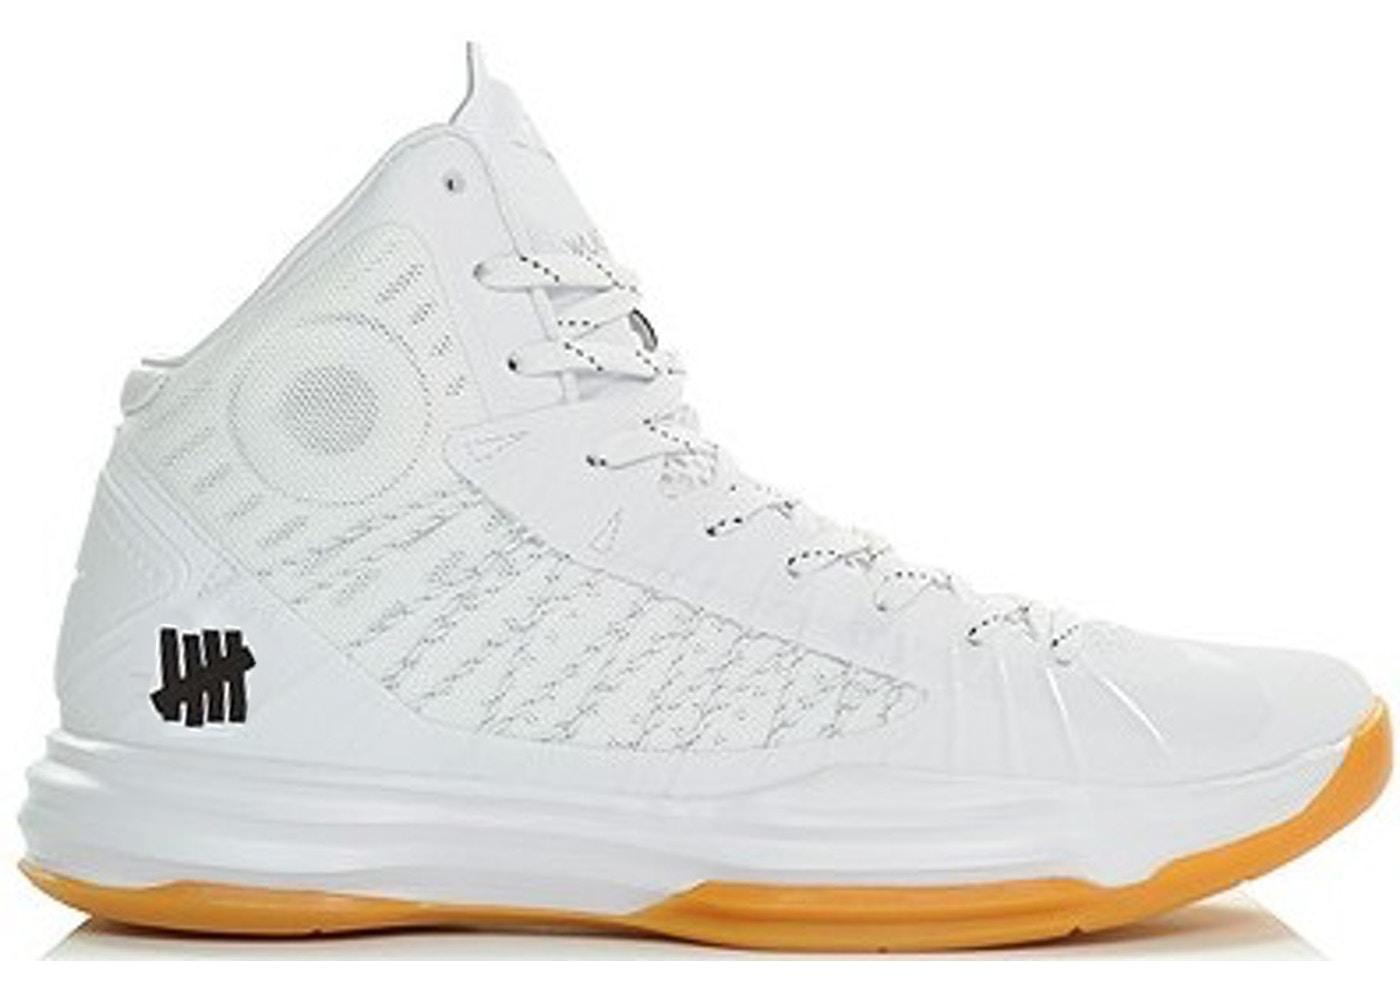 9731b1bc2cdb Nike Hyperdunk UNDFTD Bring Back Pack - 598471-110